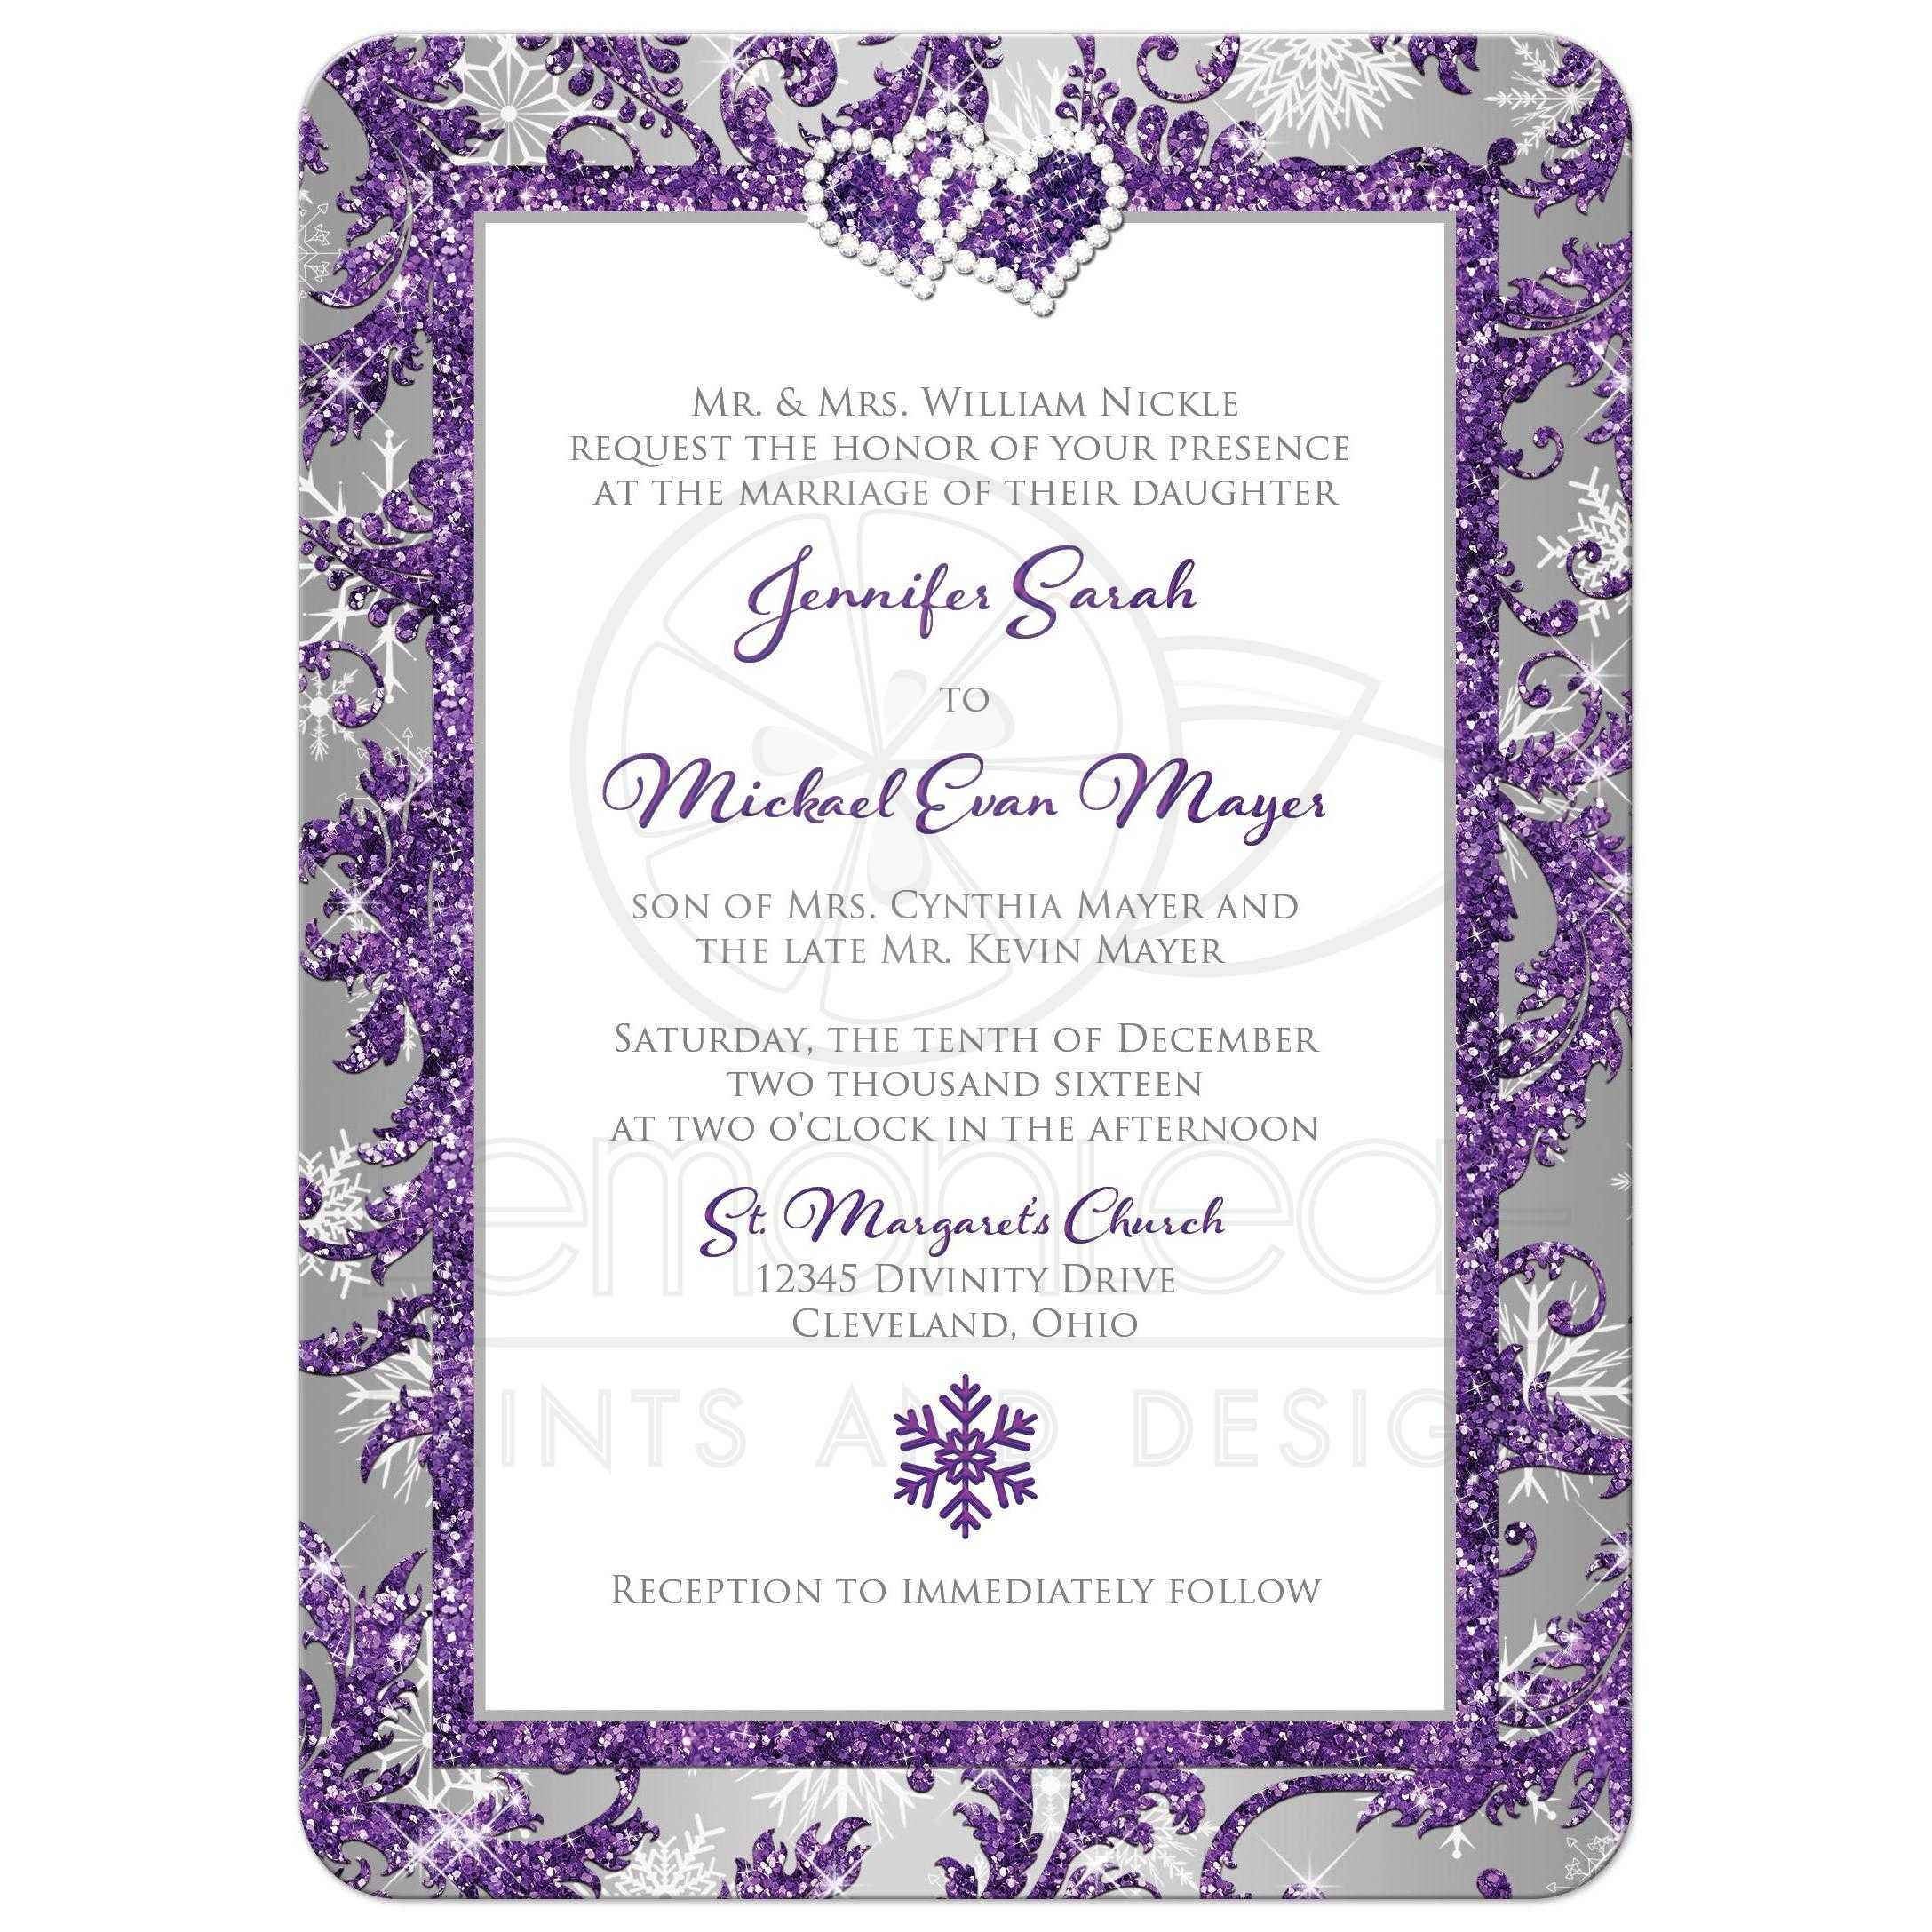 Winter Wonderland PHOTO Wedding Invitation   Purple, Silver, White ...